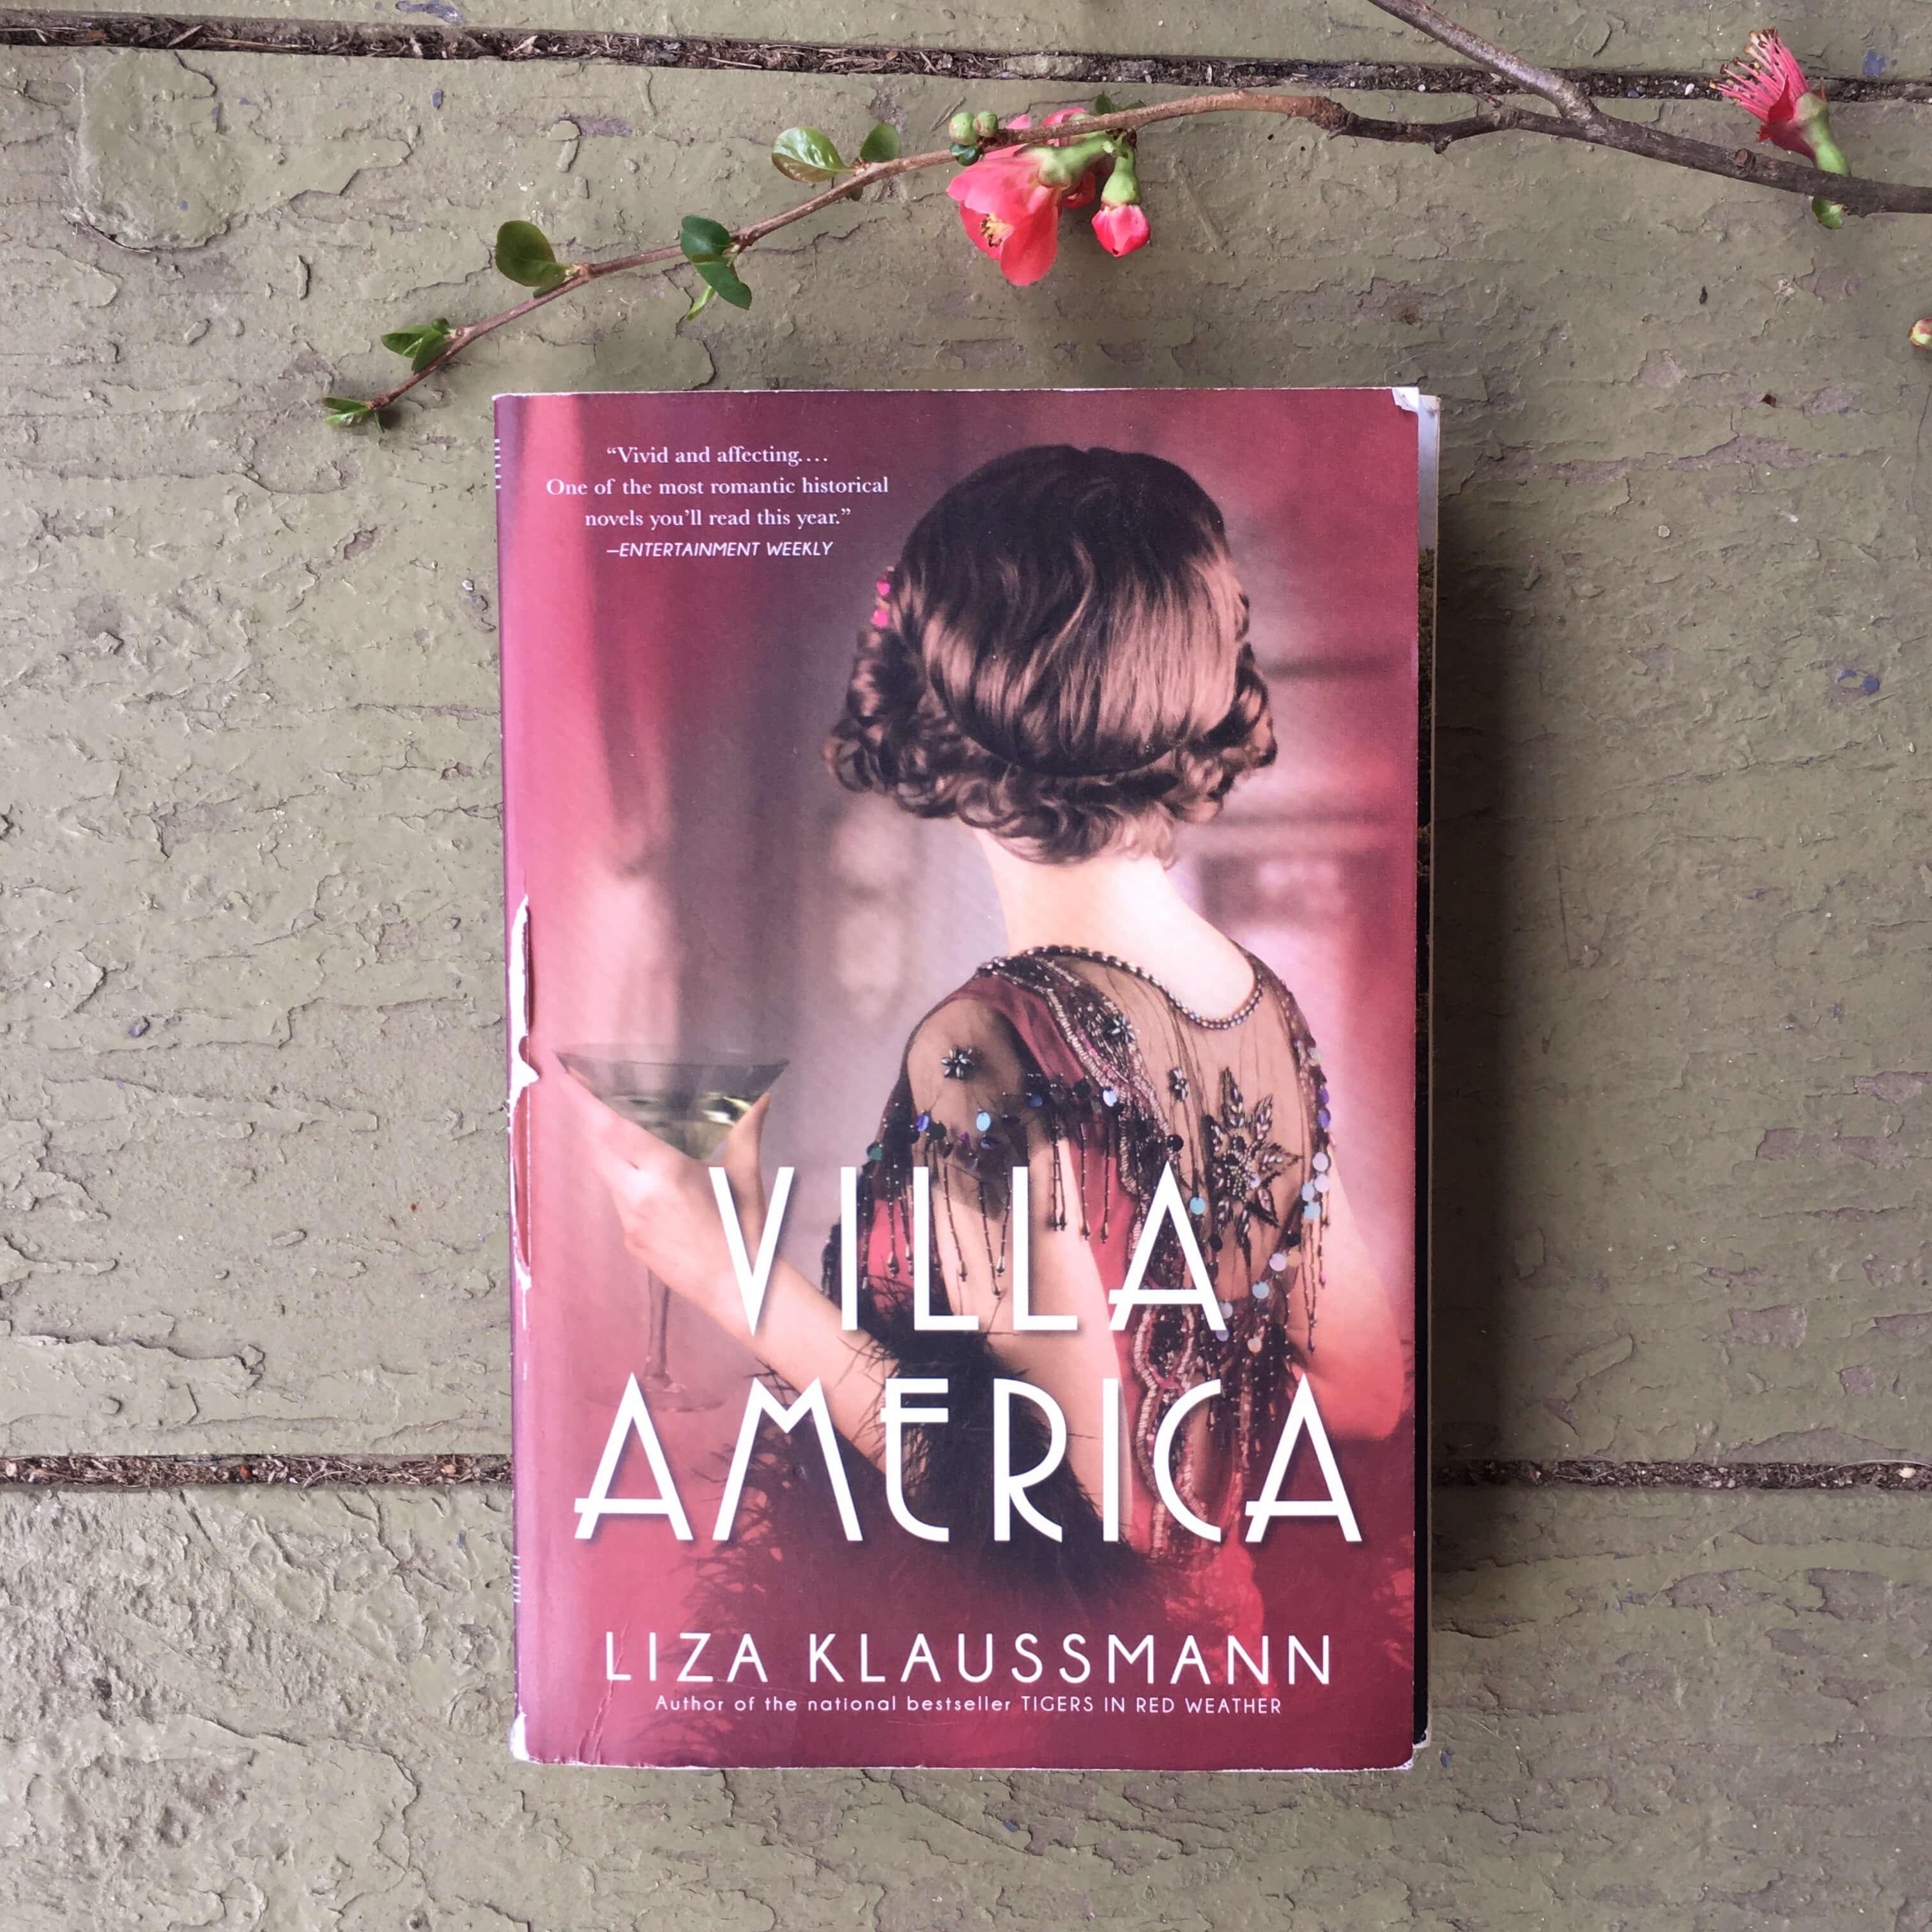 villa-america-liza-klaussmann